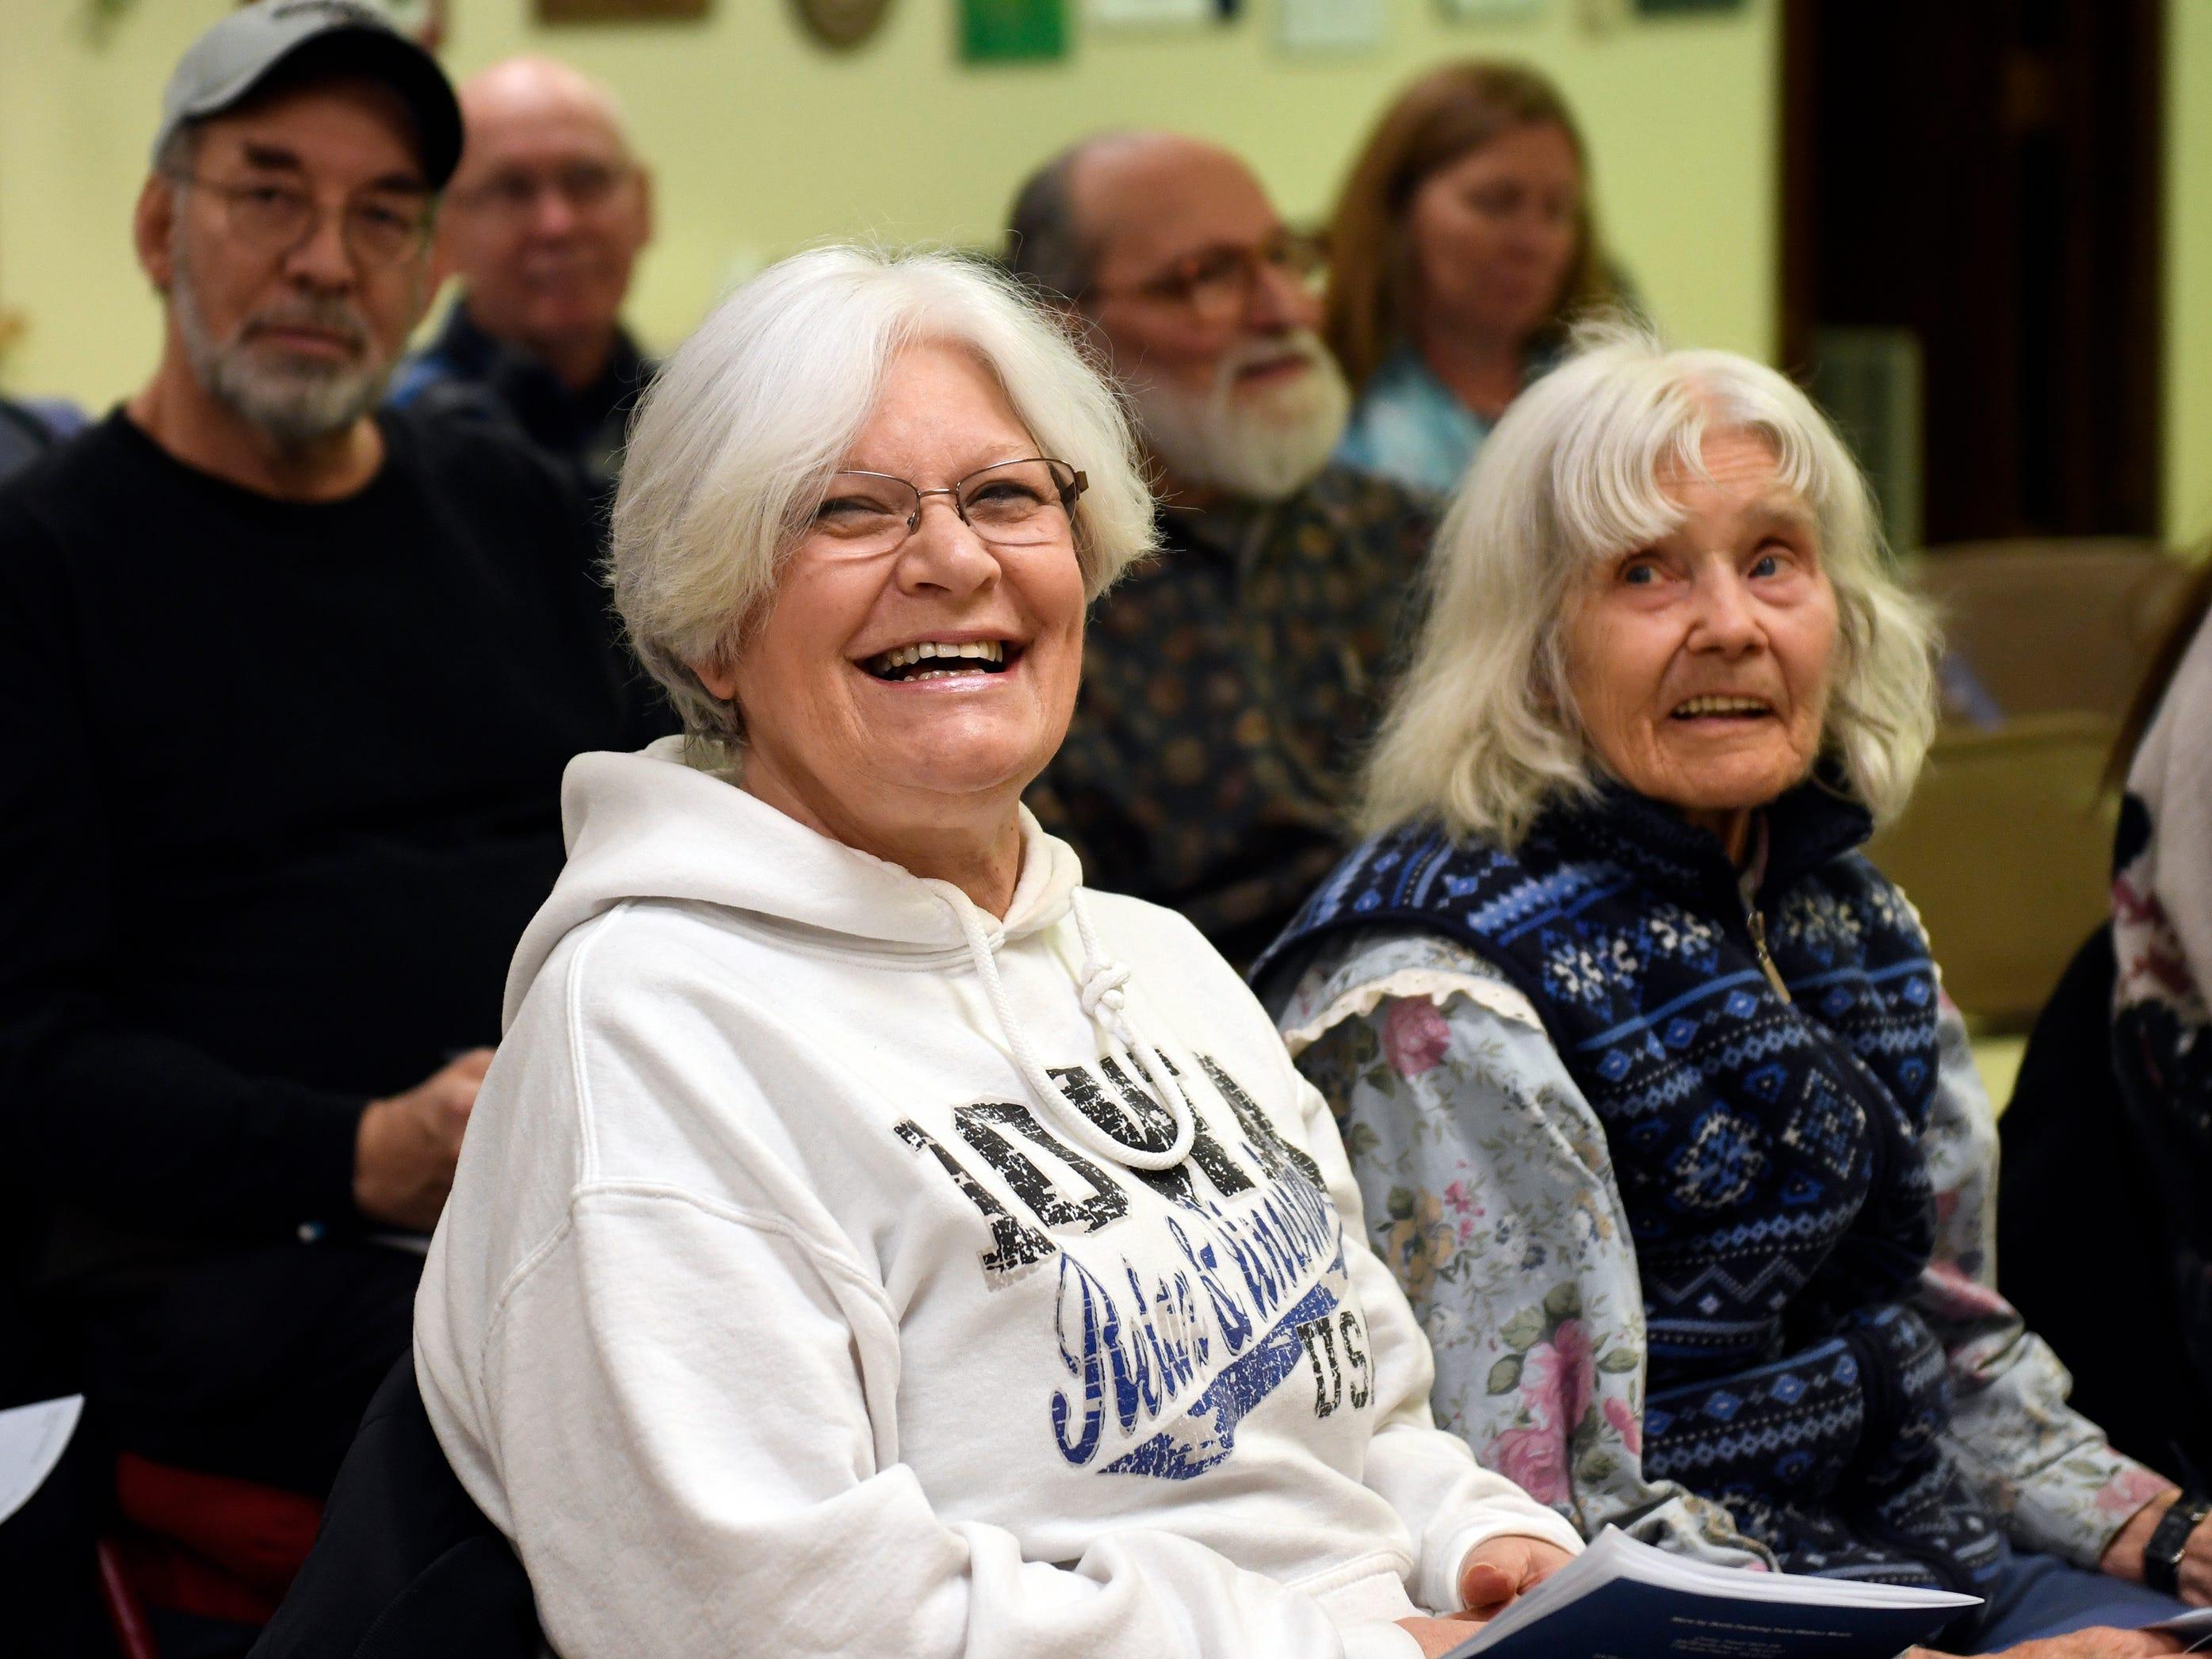 Darlene Ehrlich, a member of Vineland's Singing Ambassadors, gets ready for rehearsal at the Vineland Senior Center on Monday.